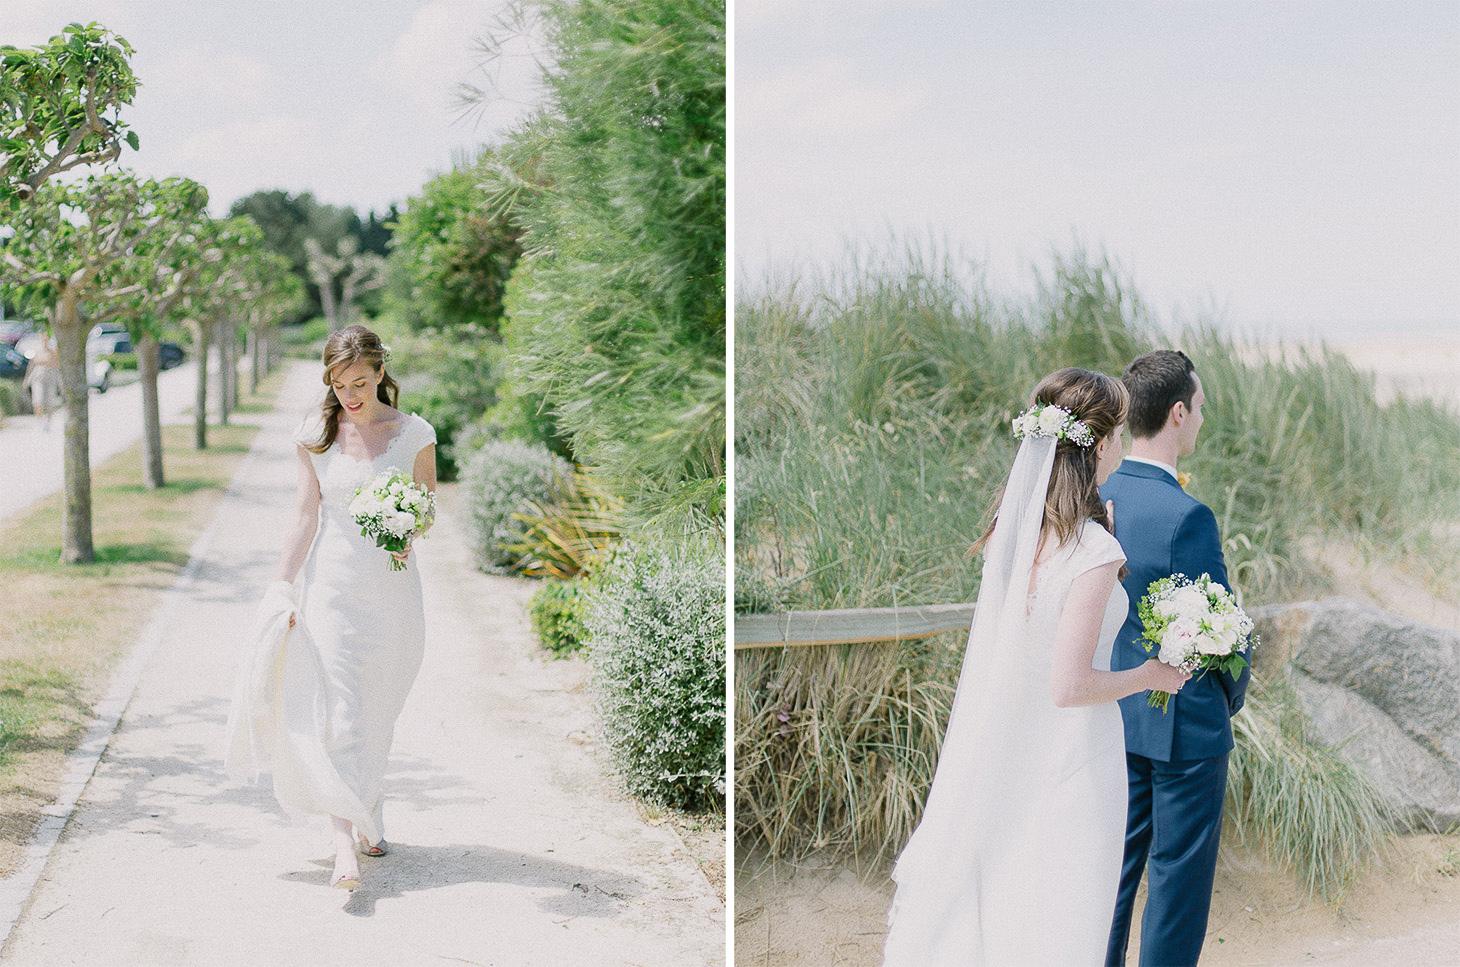 photographe-mariage-champ-de-launay-normandie-00019